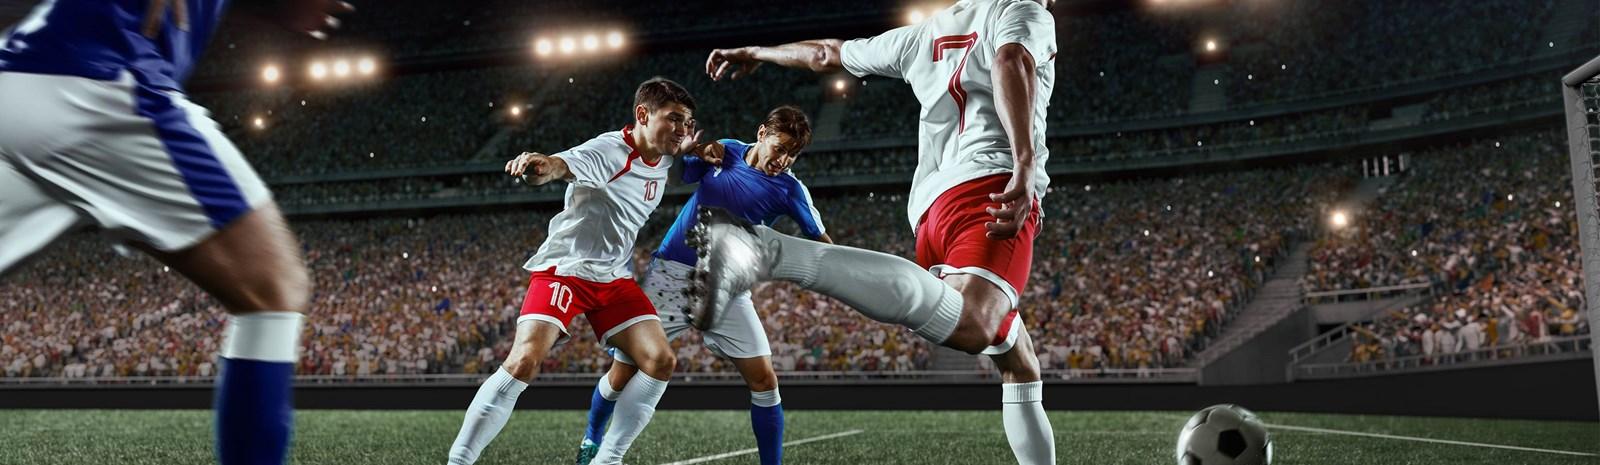 Sponsorship Fodbold Topbanner 3100X1330px